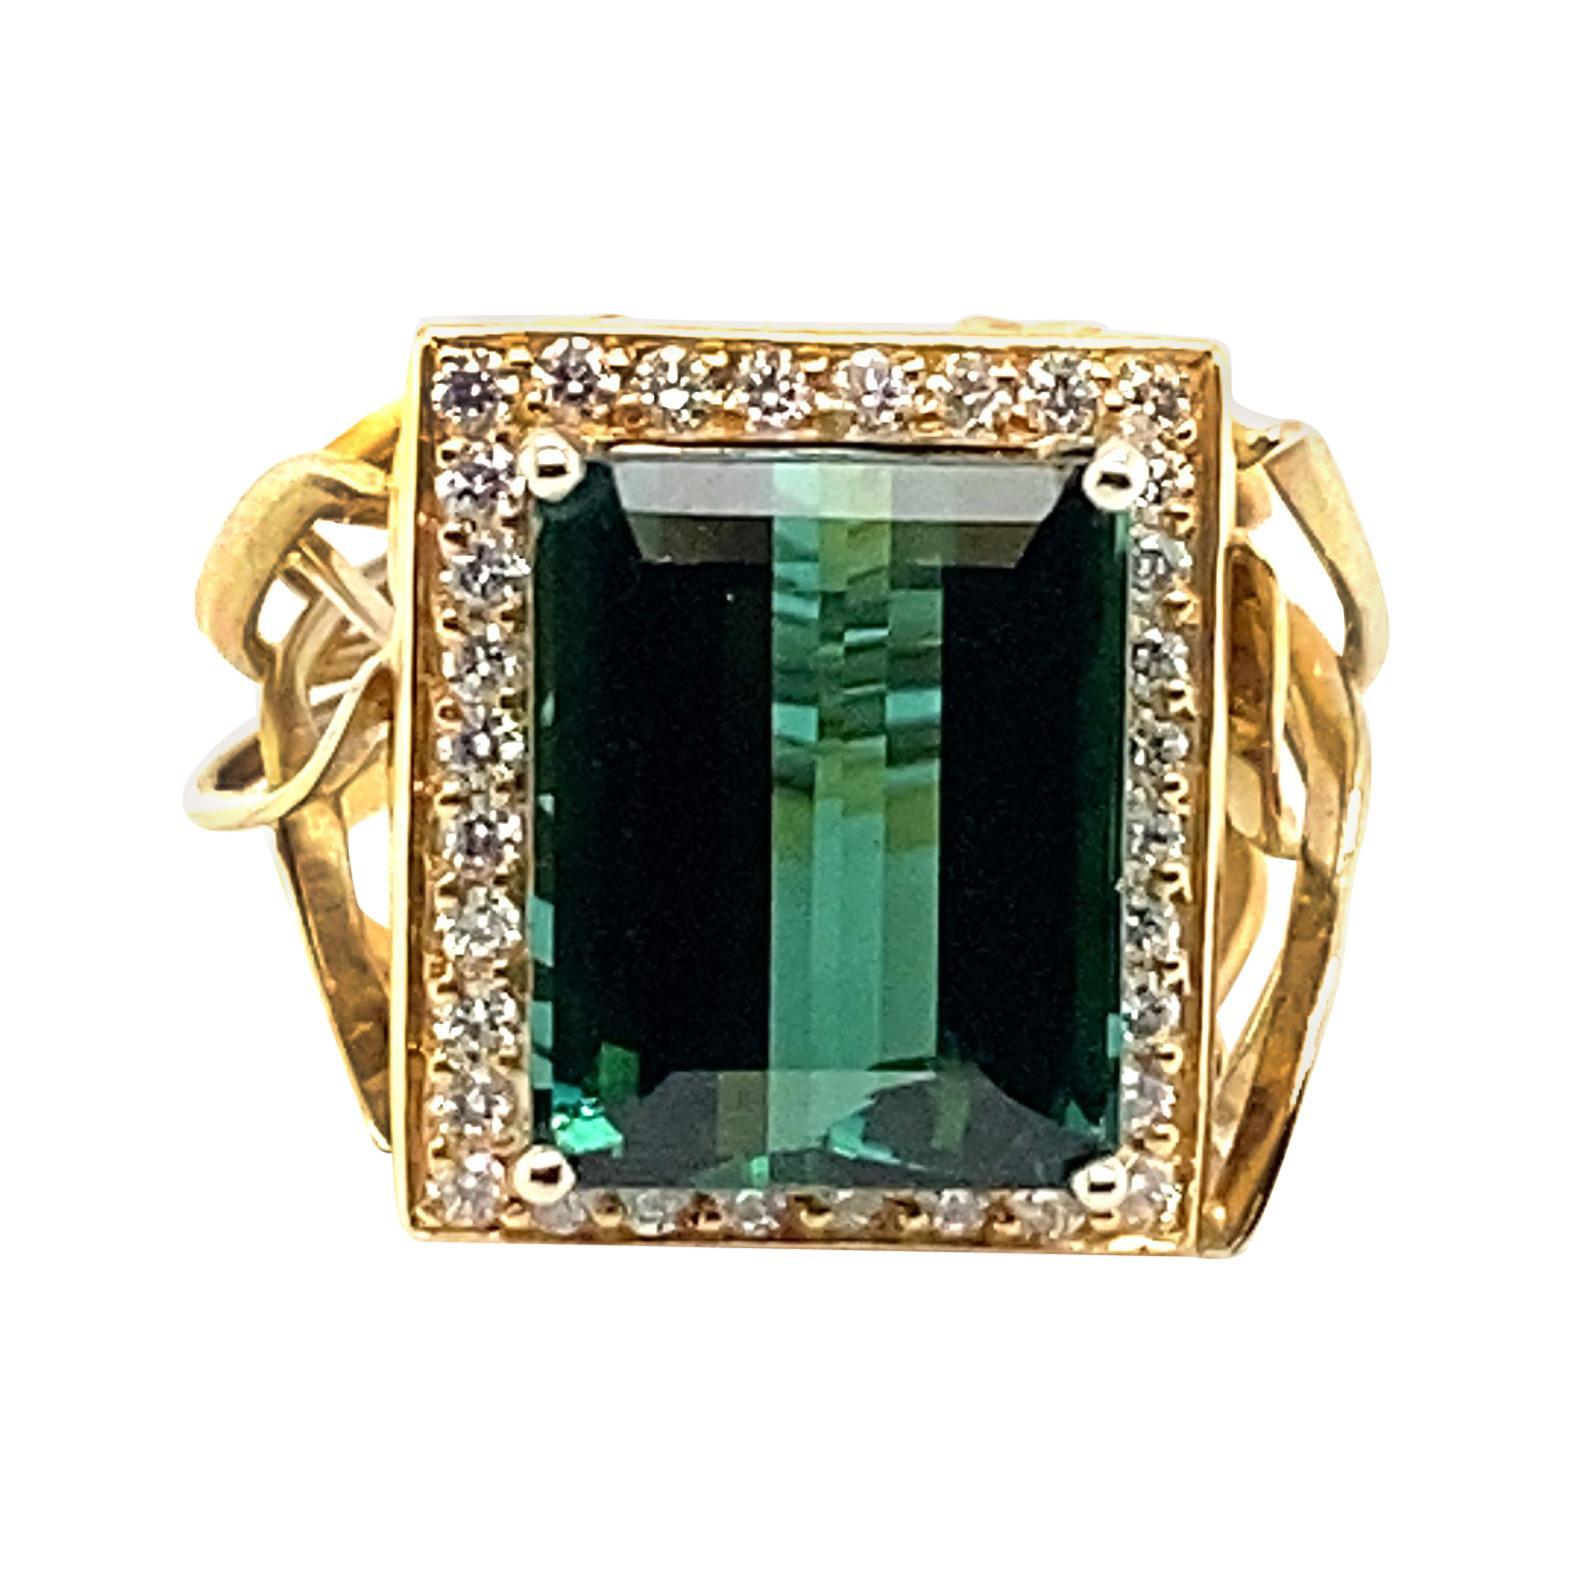 10 Carat Indicolite Tourmaline with .60 Carats of Diamonds